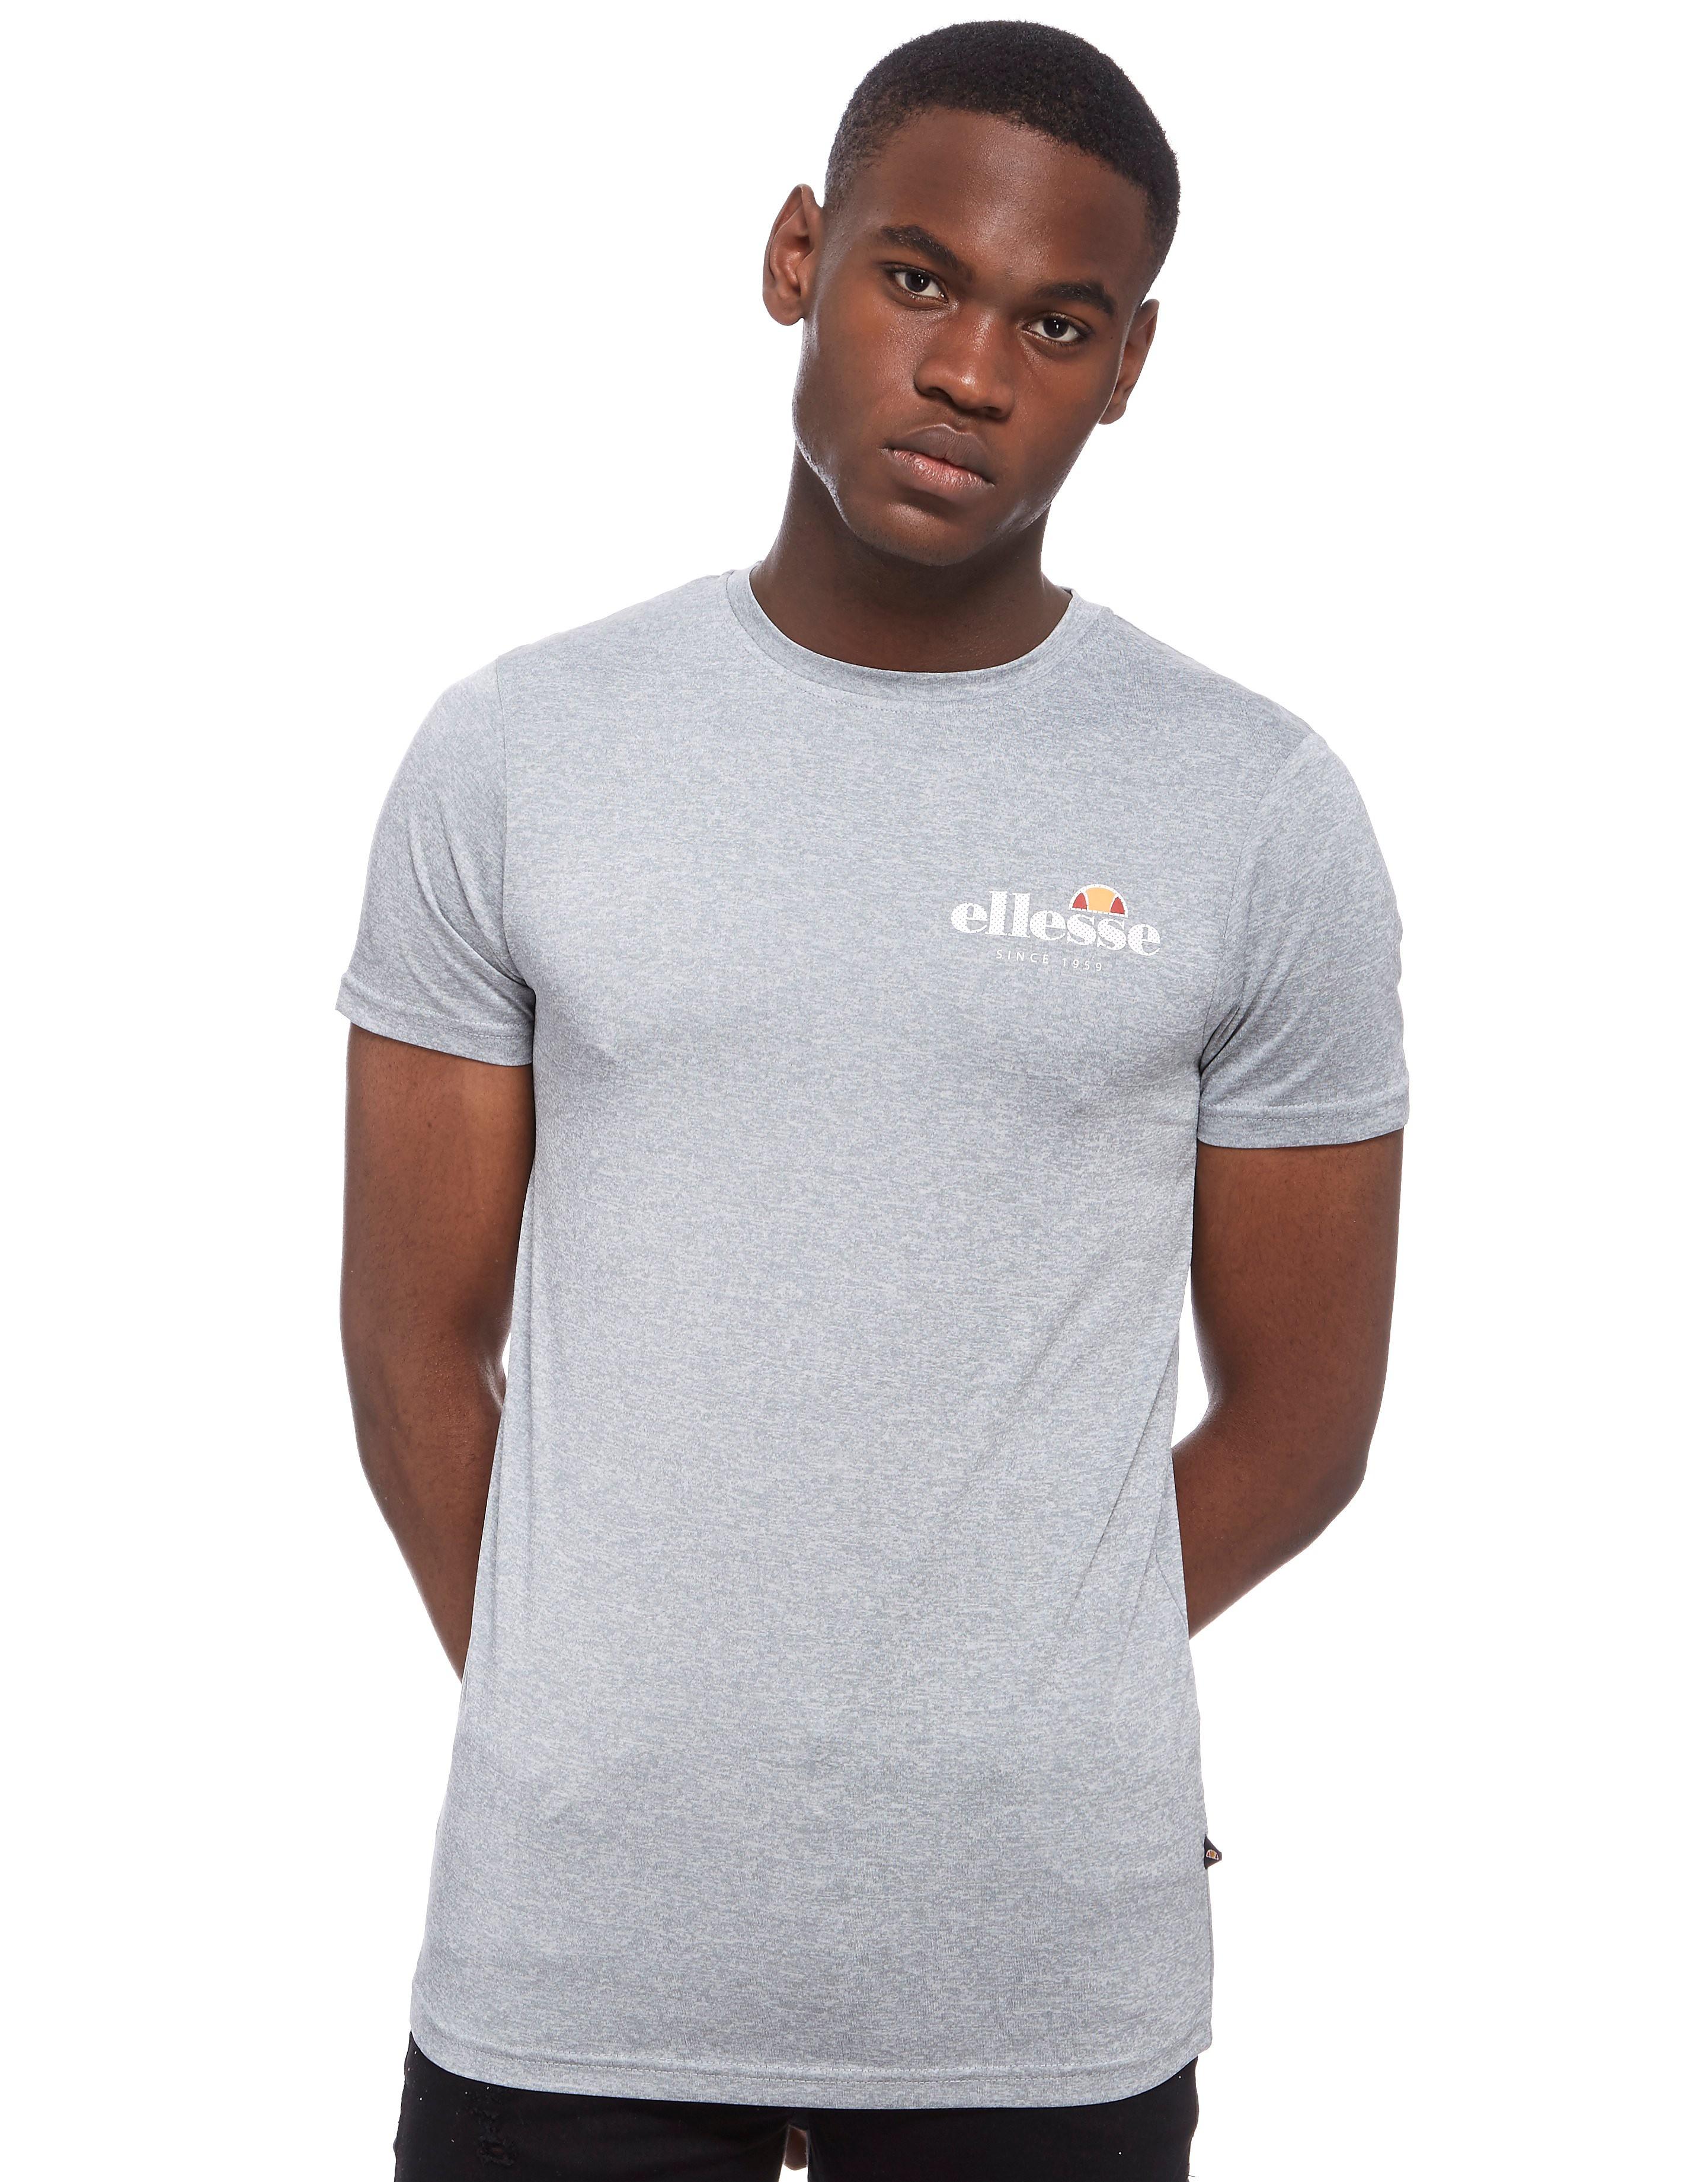 Ellesse Finto Back Print T-Shirt